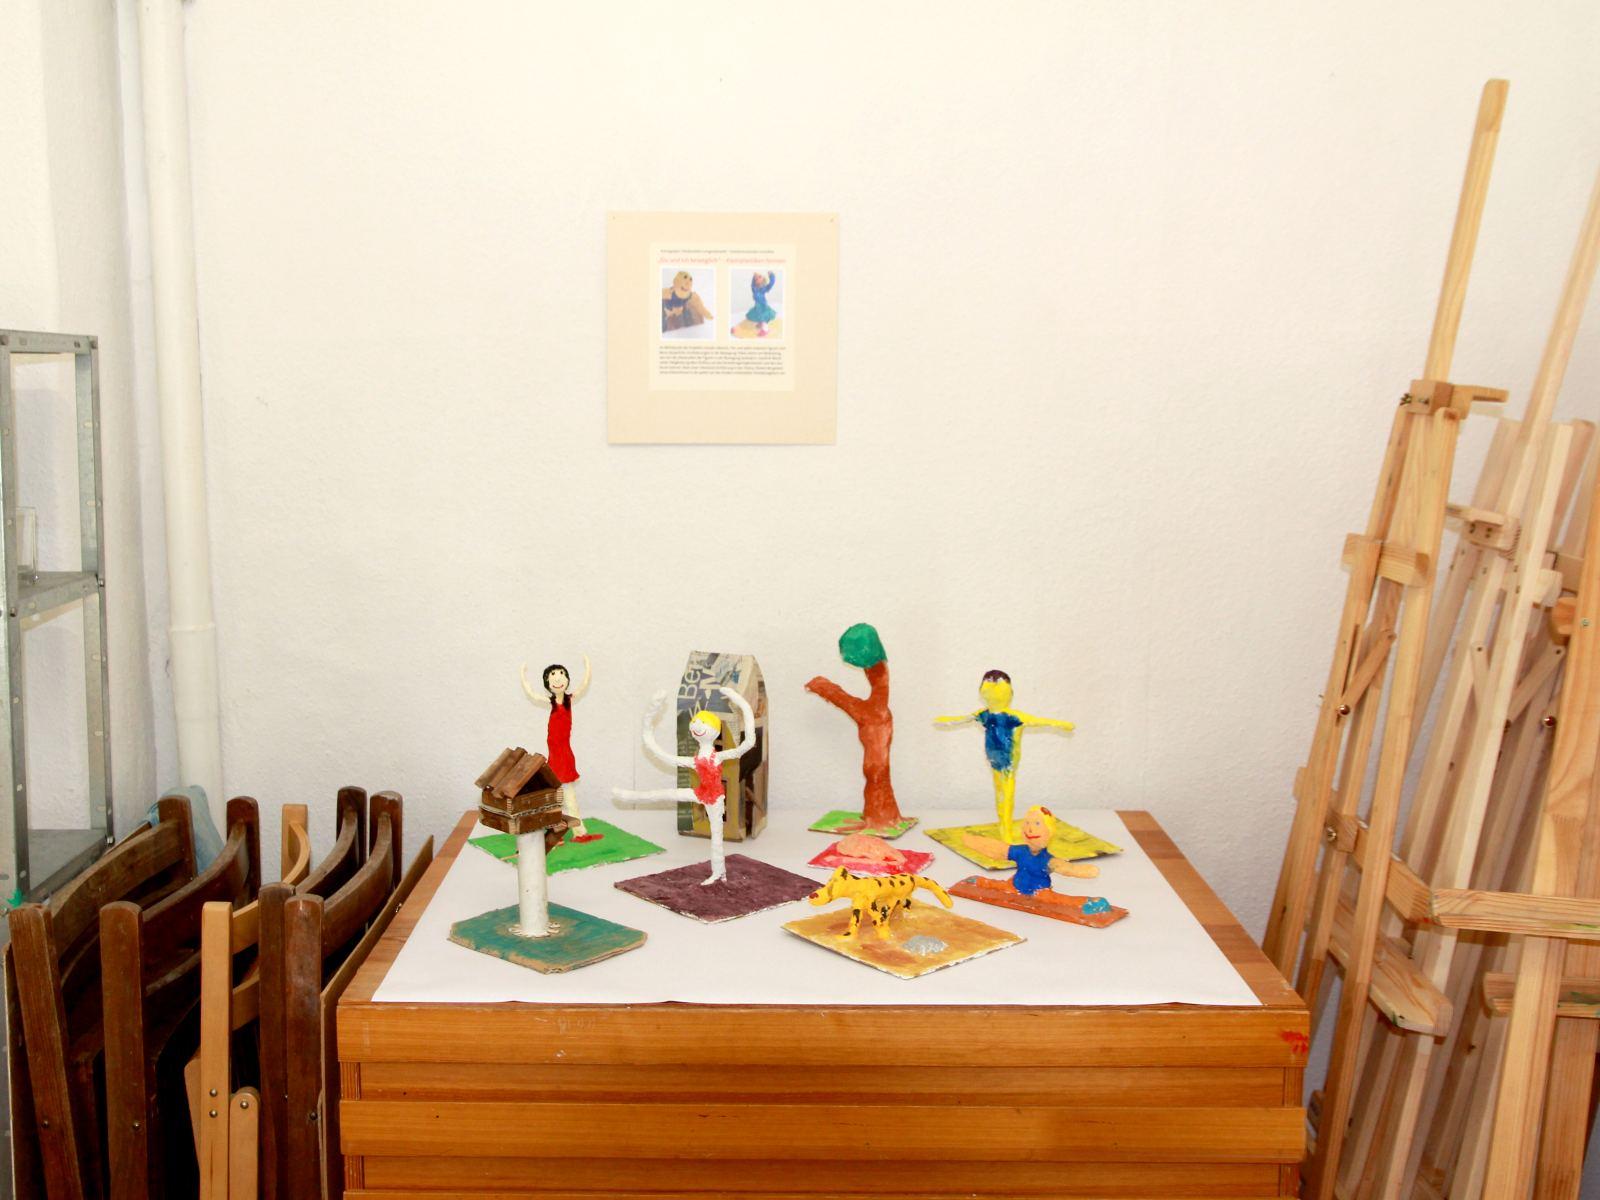 Kunstgespuer Kinderatelier-Ausstellung-Fantasievolle-Druckgrafik-Plastik Exponate